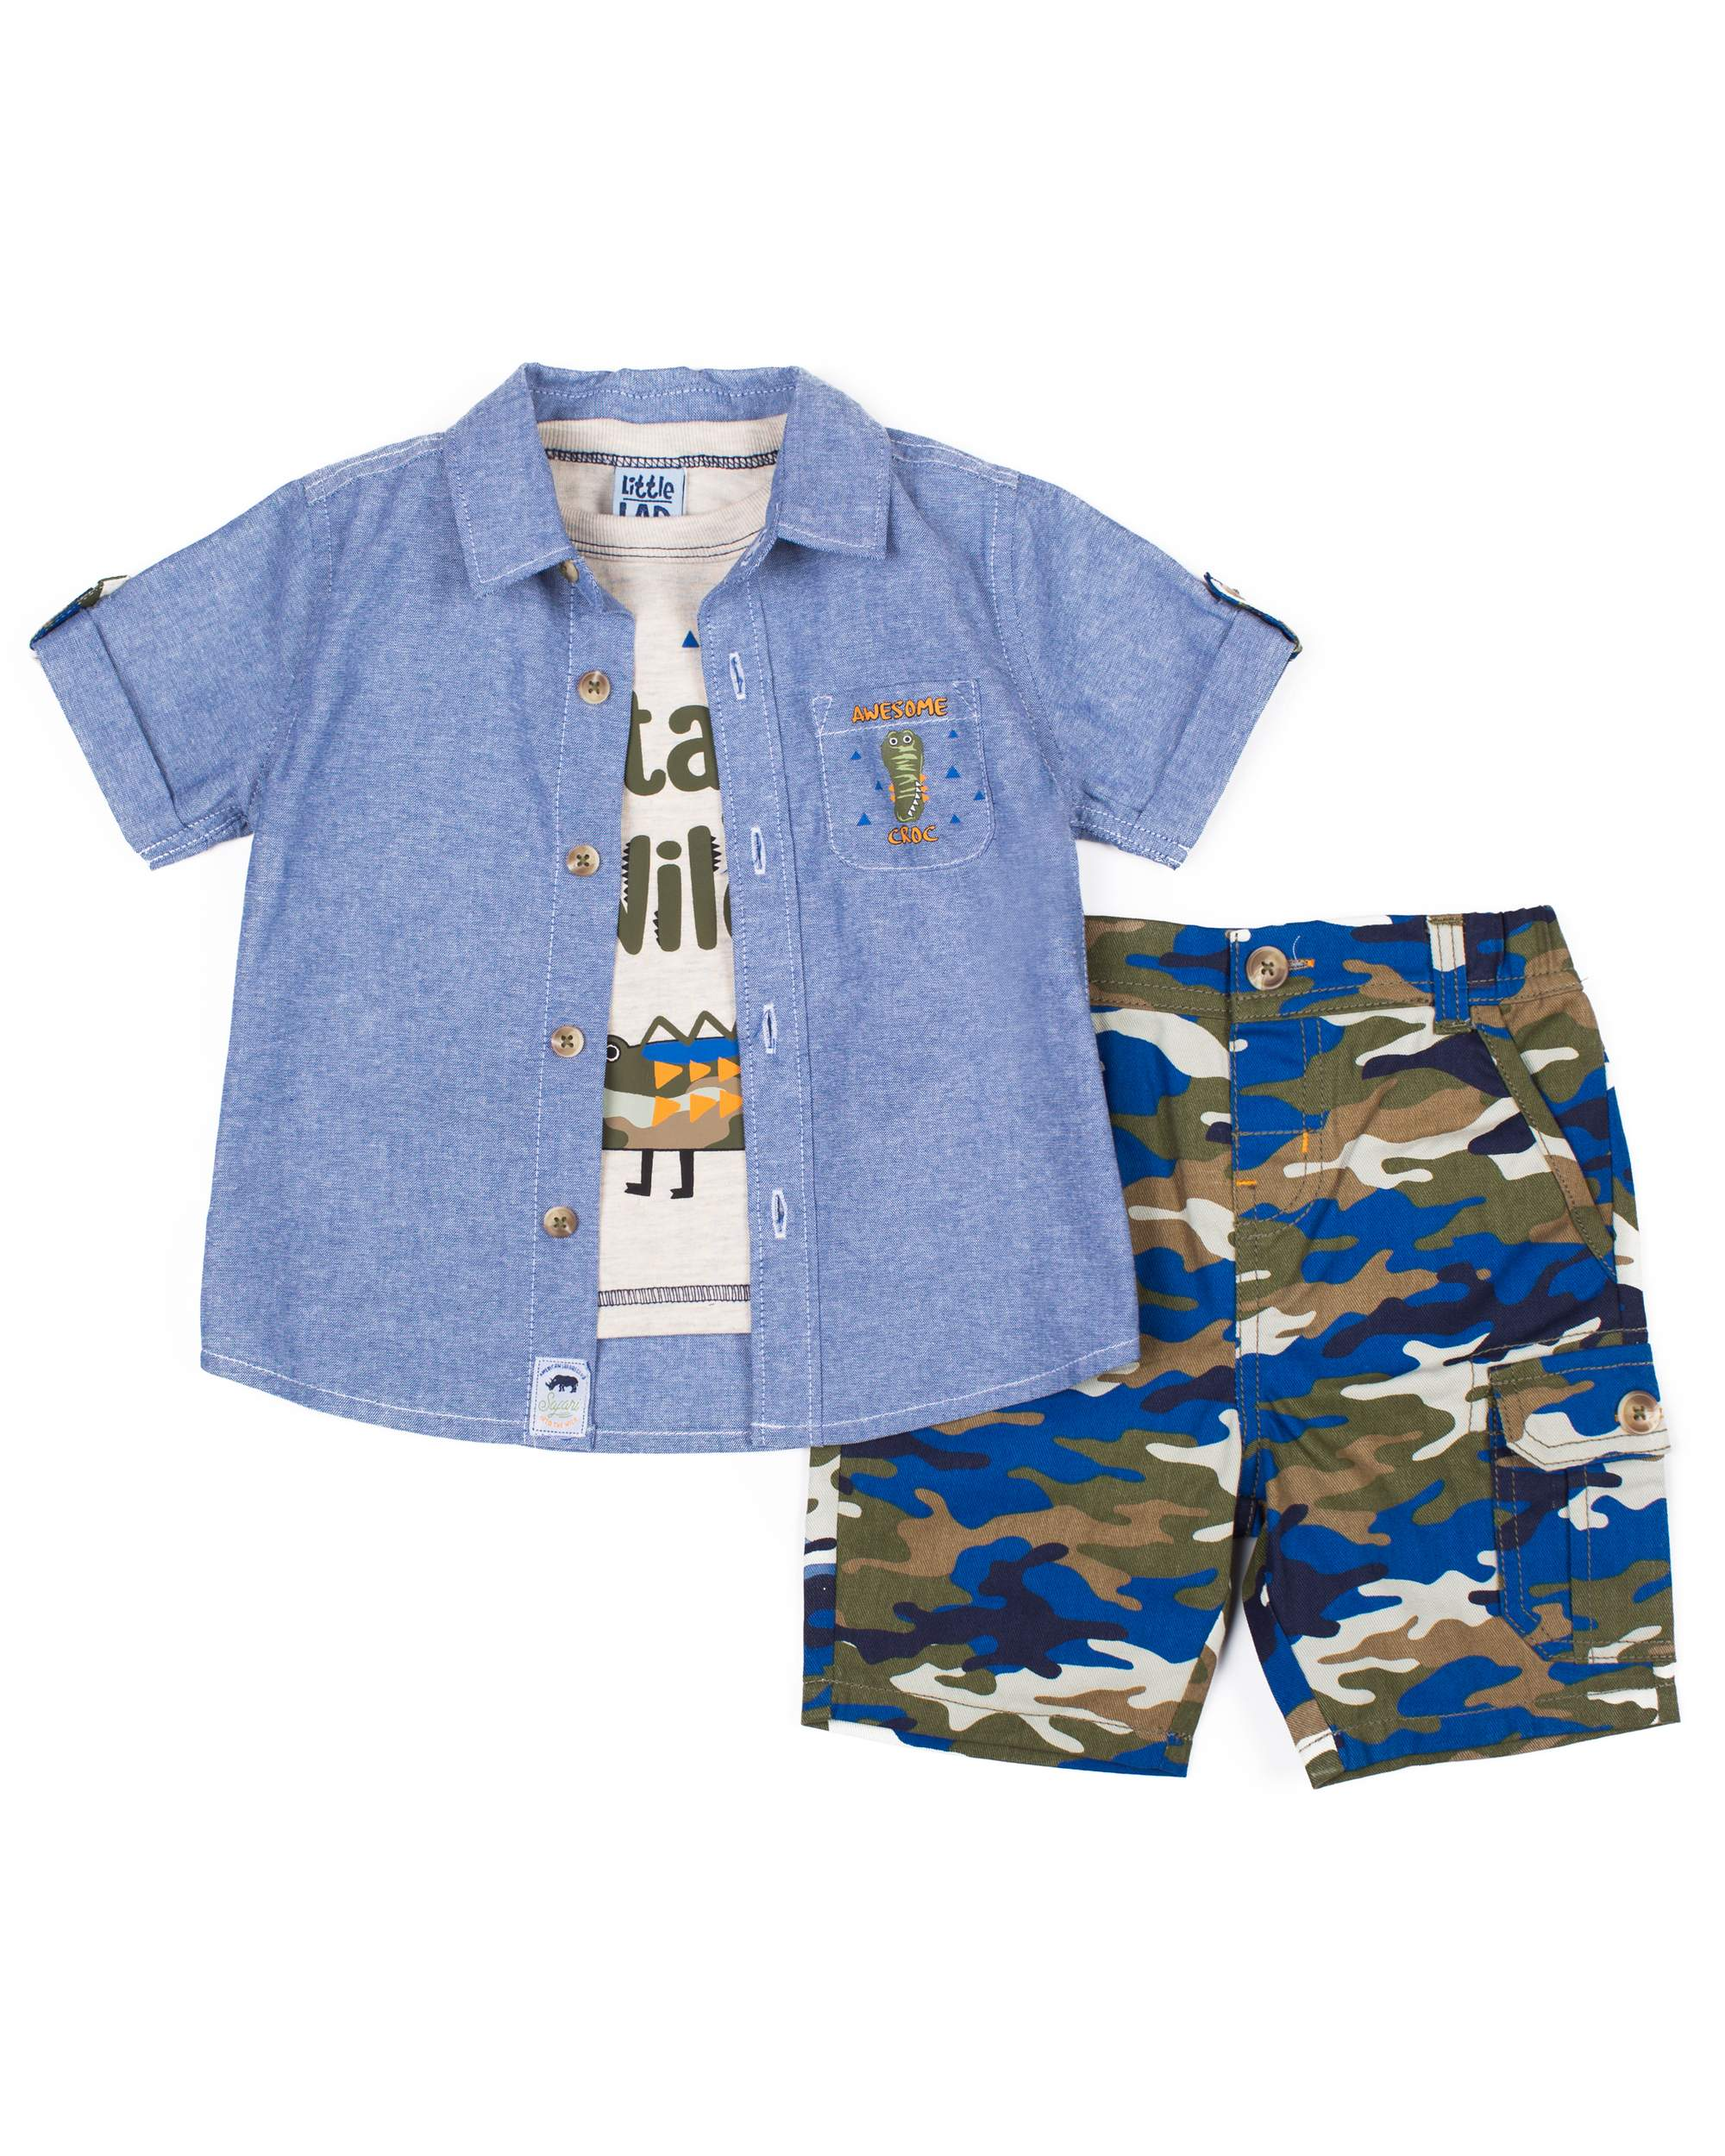 93912673d Little Lad - Short Sleeve Chambray Button Up Shirt